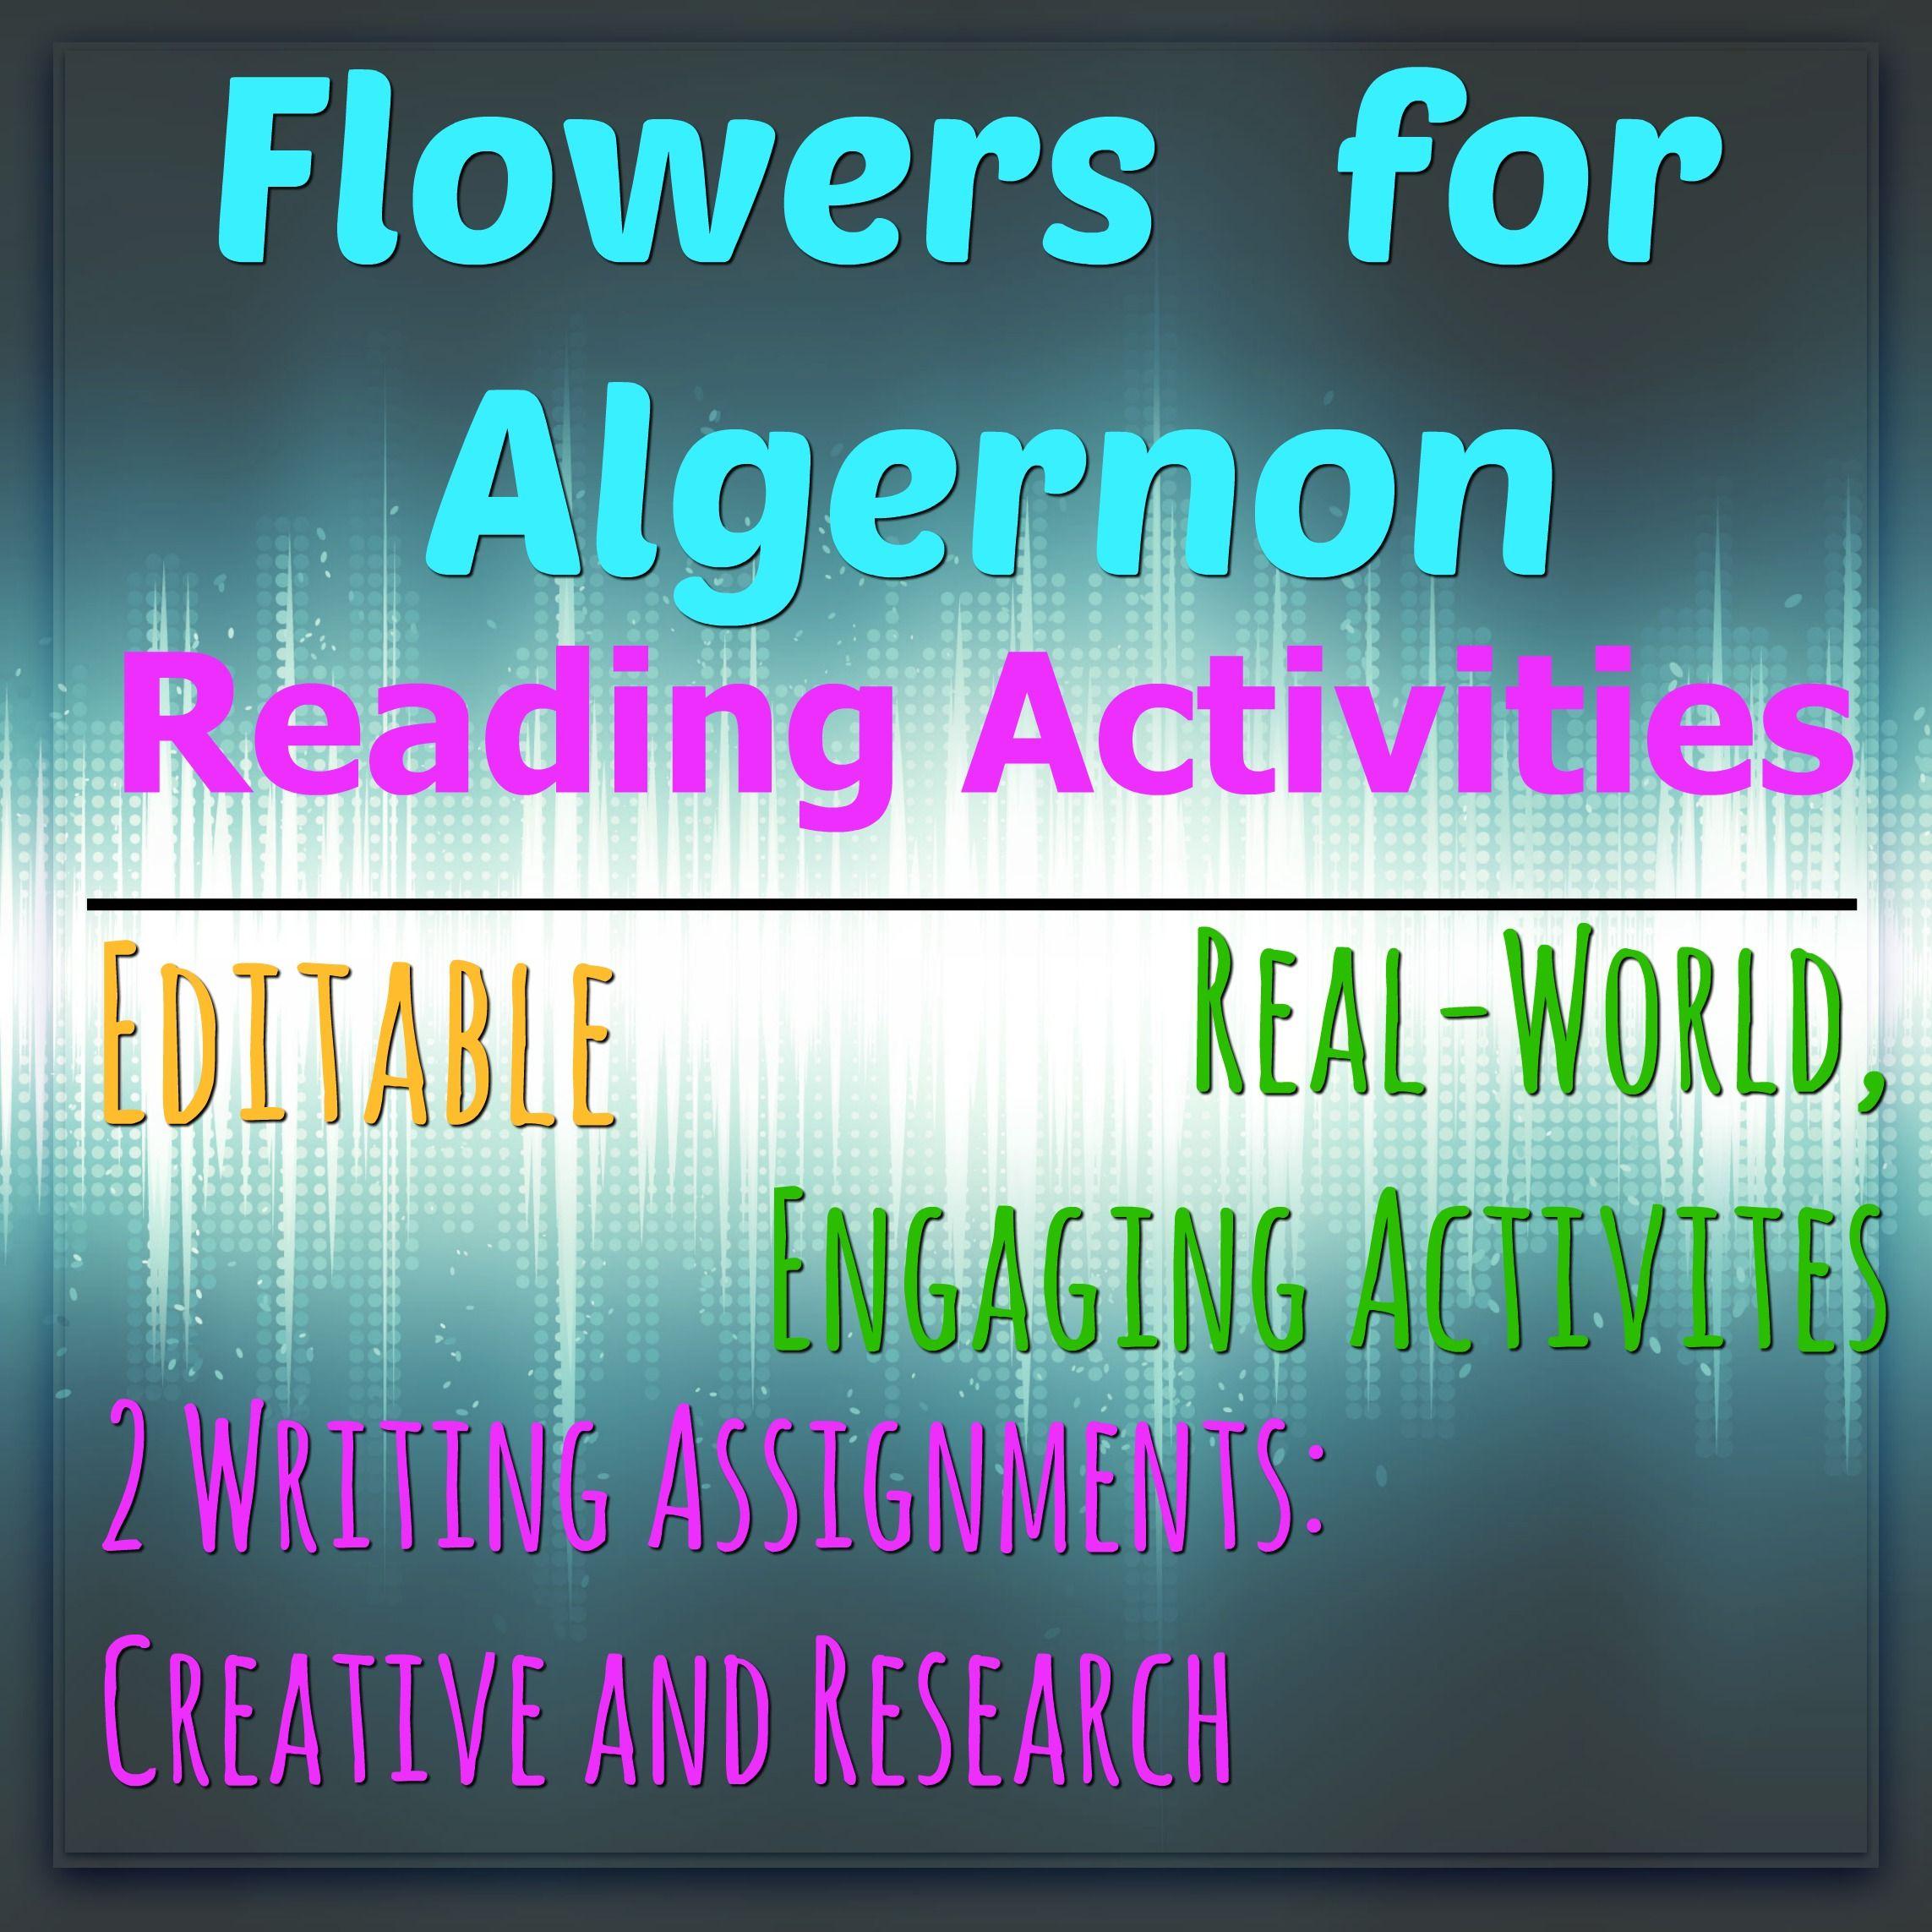 Literature Activities That Focus On Real World Topics